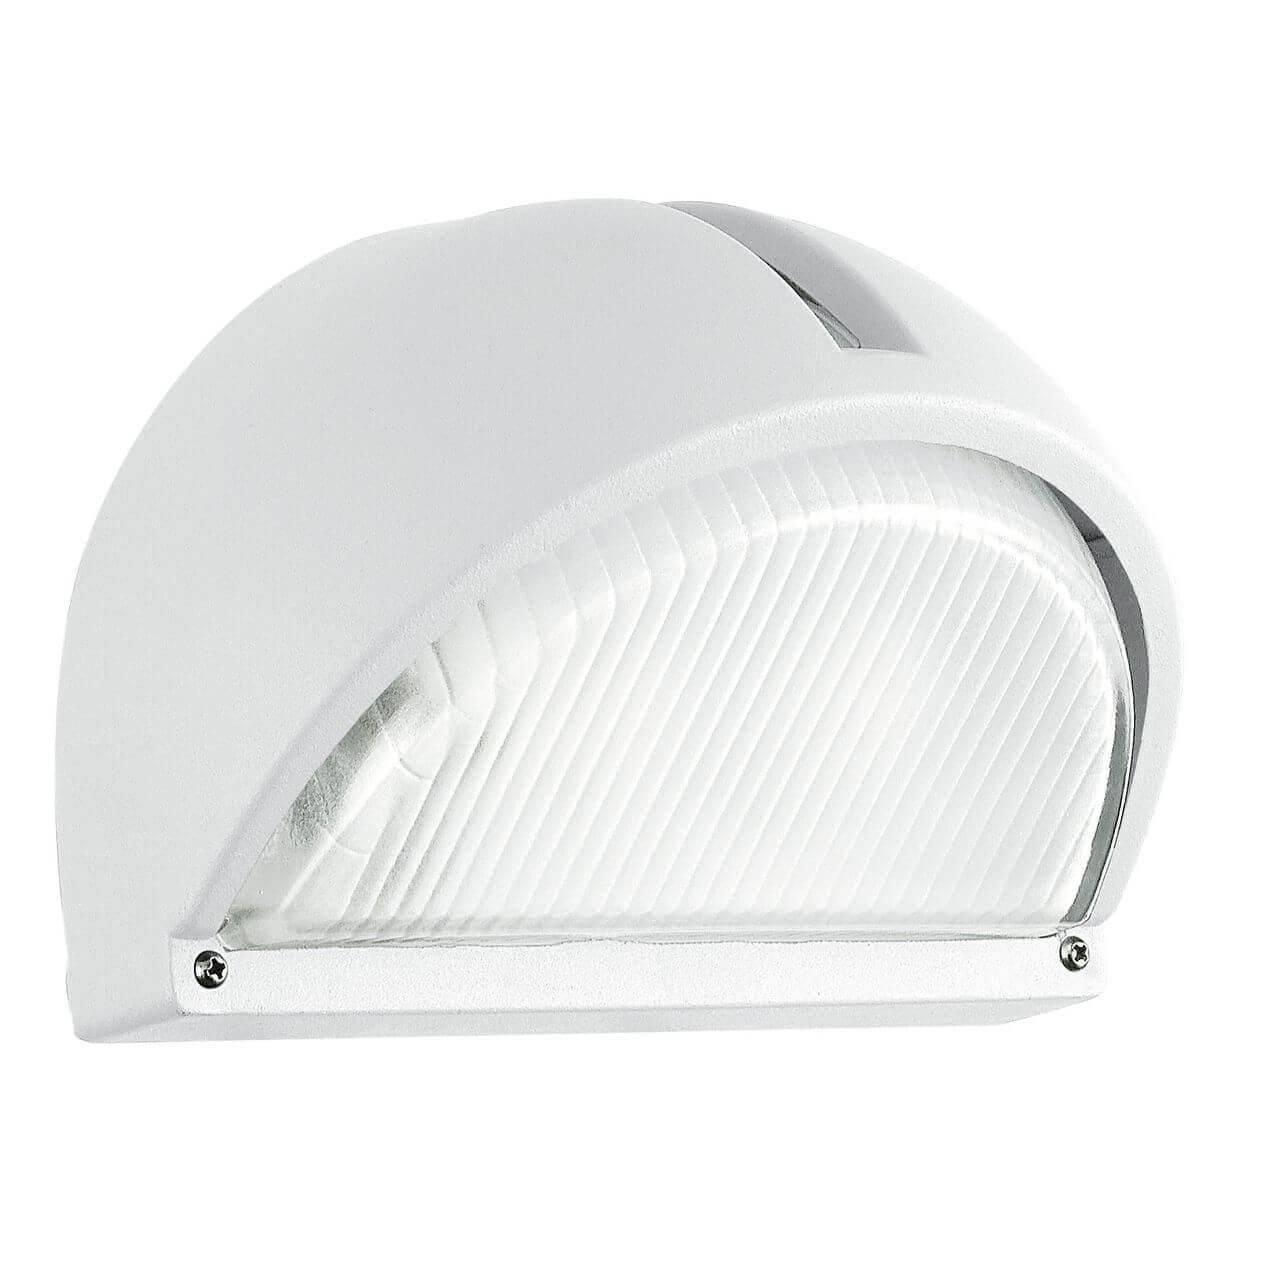 цена на Уличный светильник Eglo 89768, E27